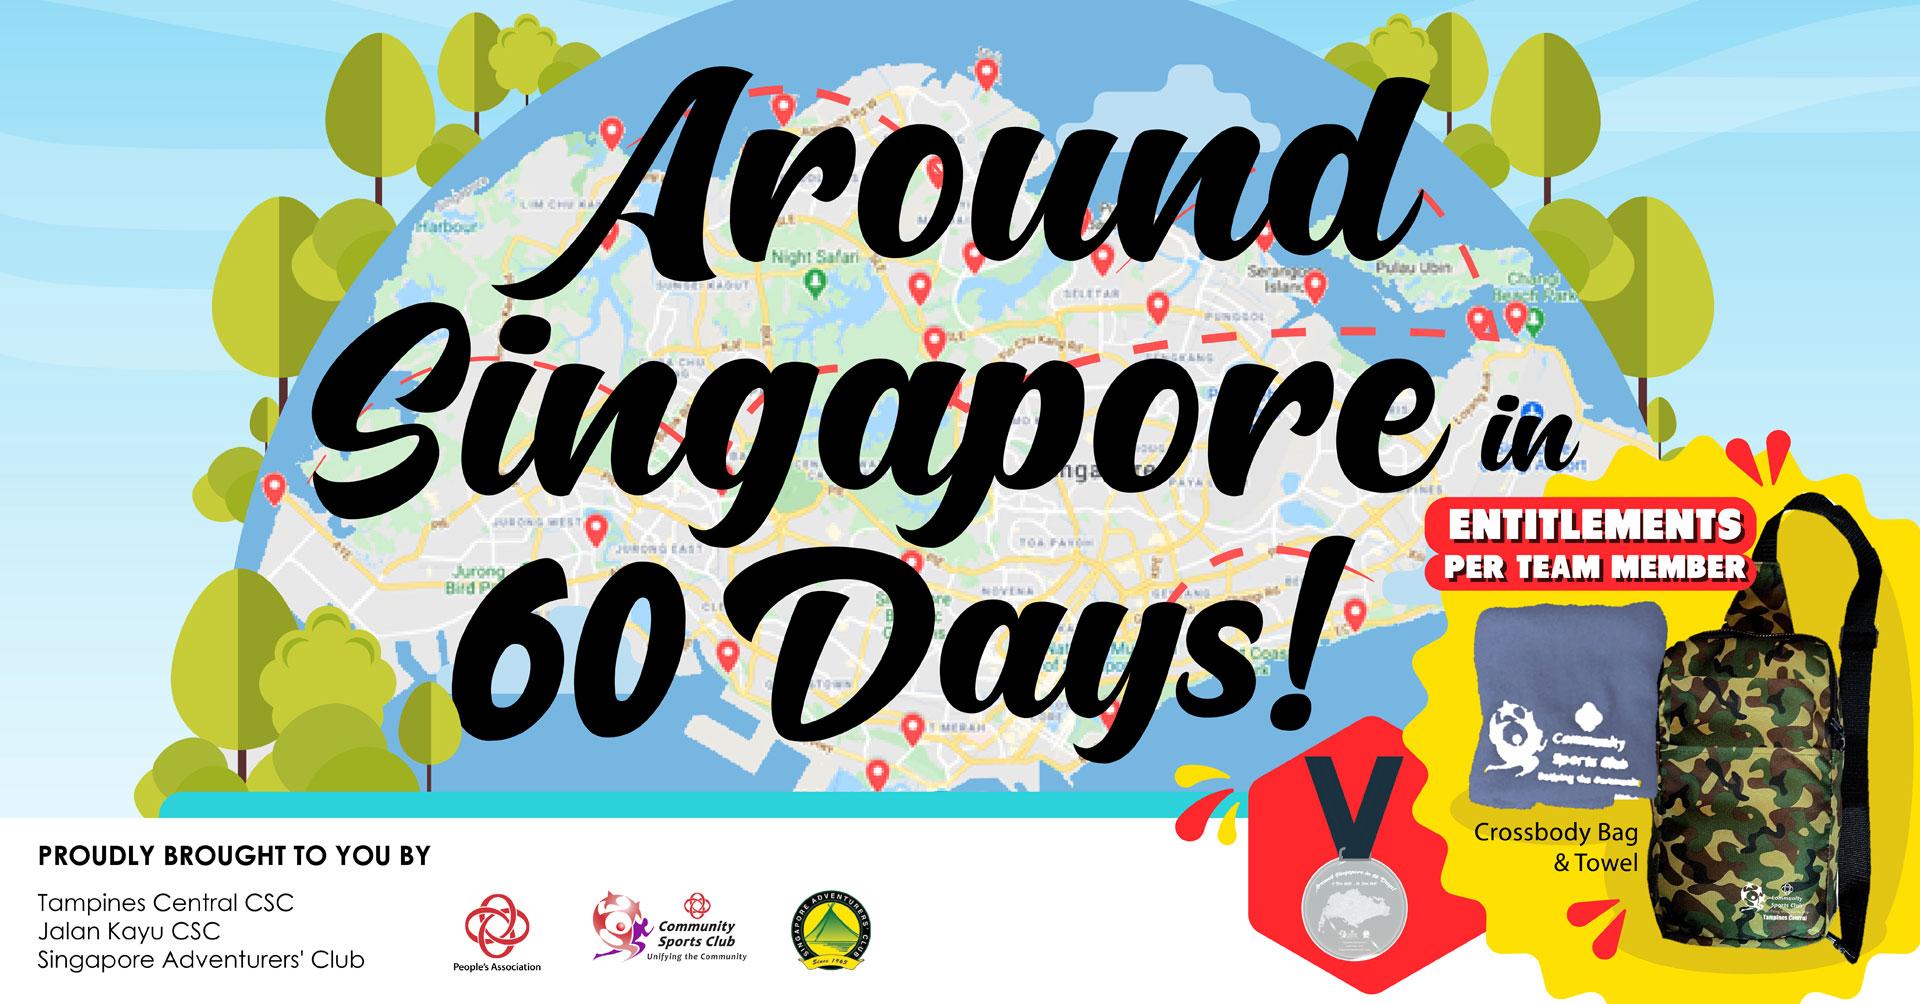 Logo of Around Singapore in 60 Days 2020